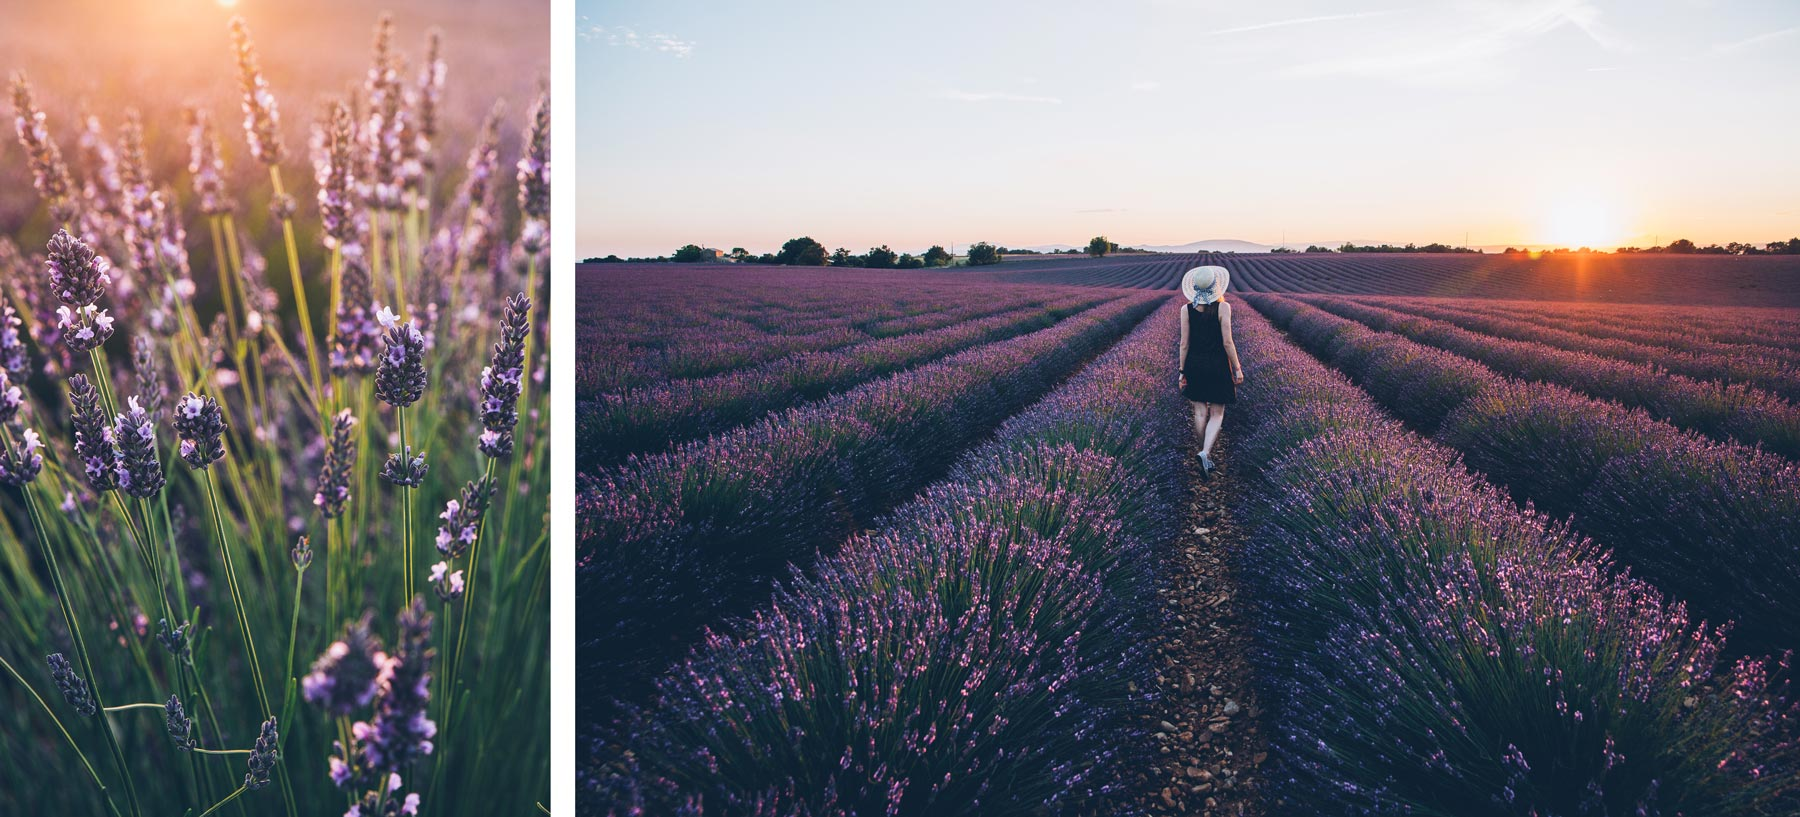 Plateau de Valensole, Provence